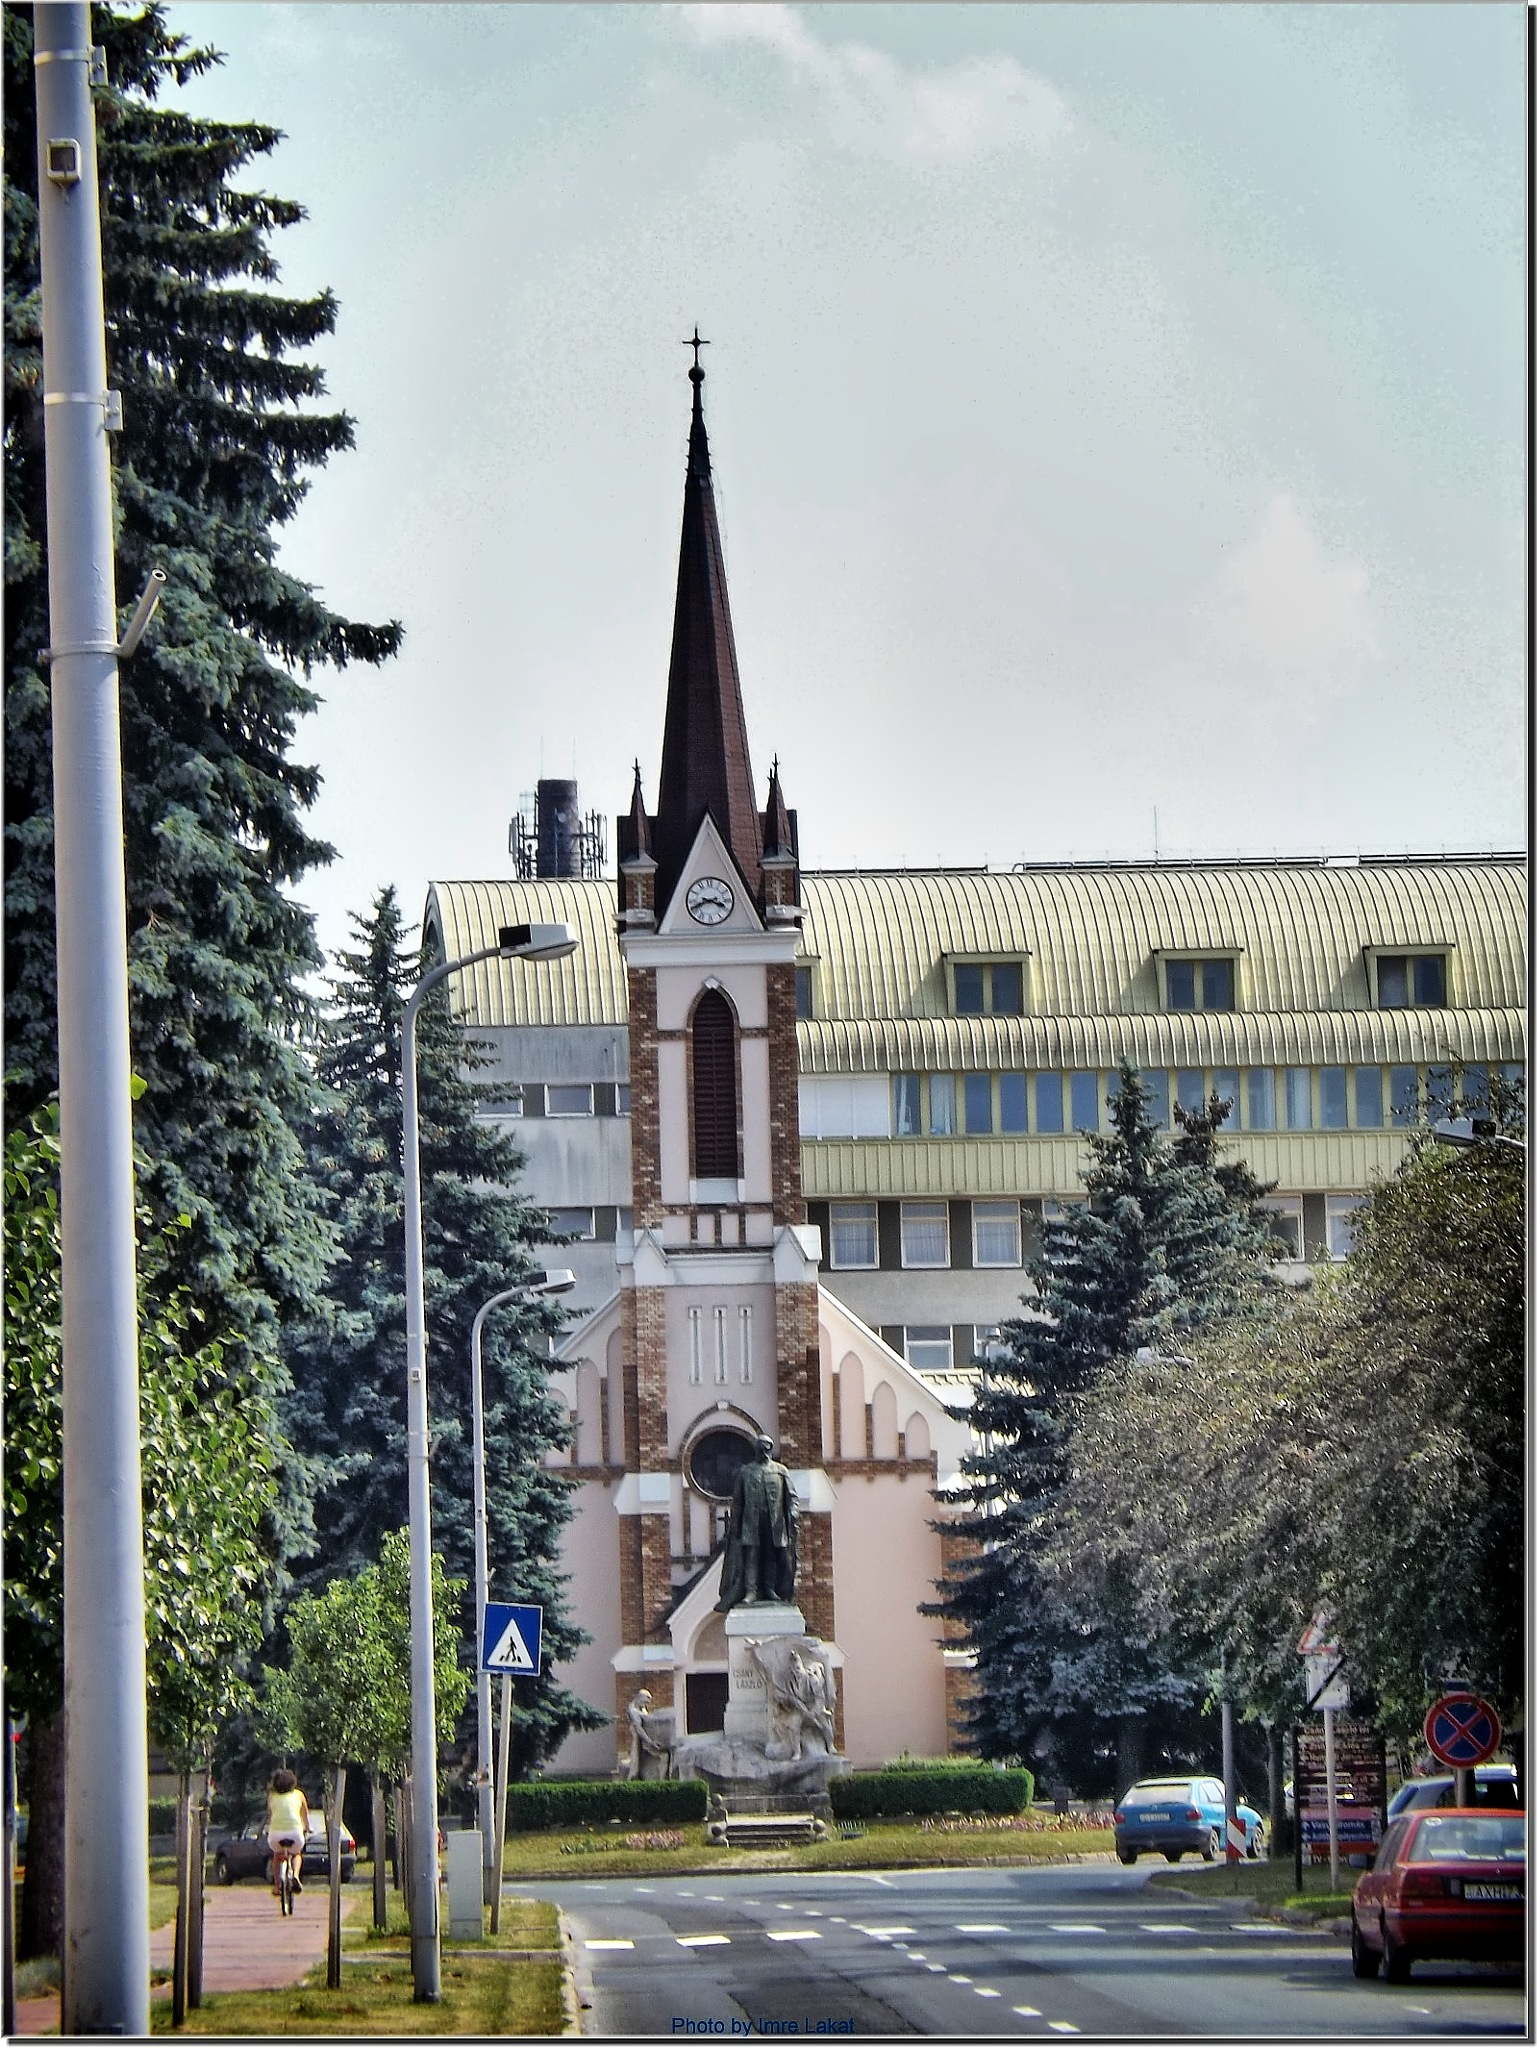 Lutherische Kirche in Zalaegerszeg by Imre Lakat